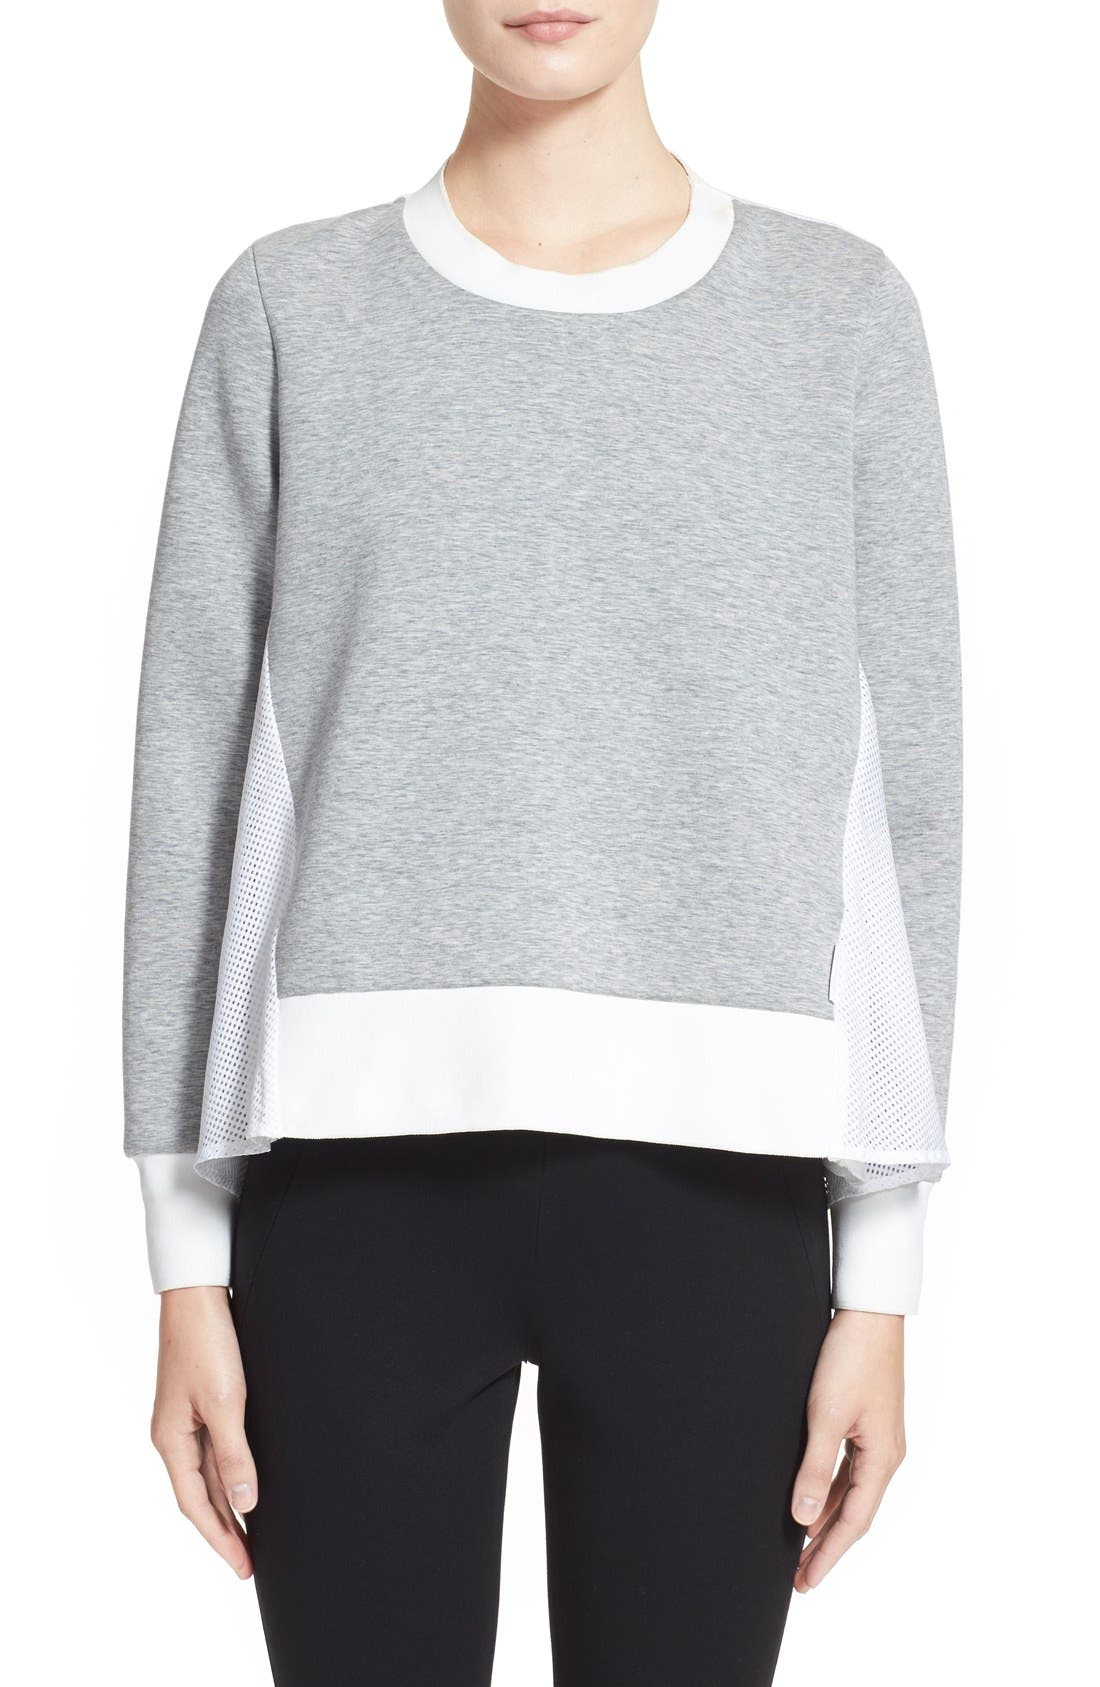 'Maglia Girocollo' Mixed Media Sweatshirt, Main, color, 021